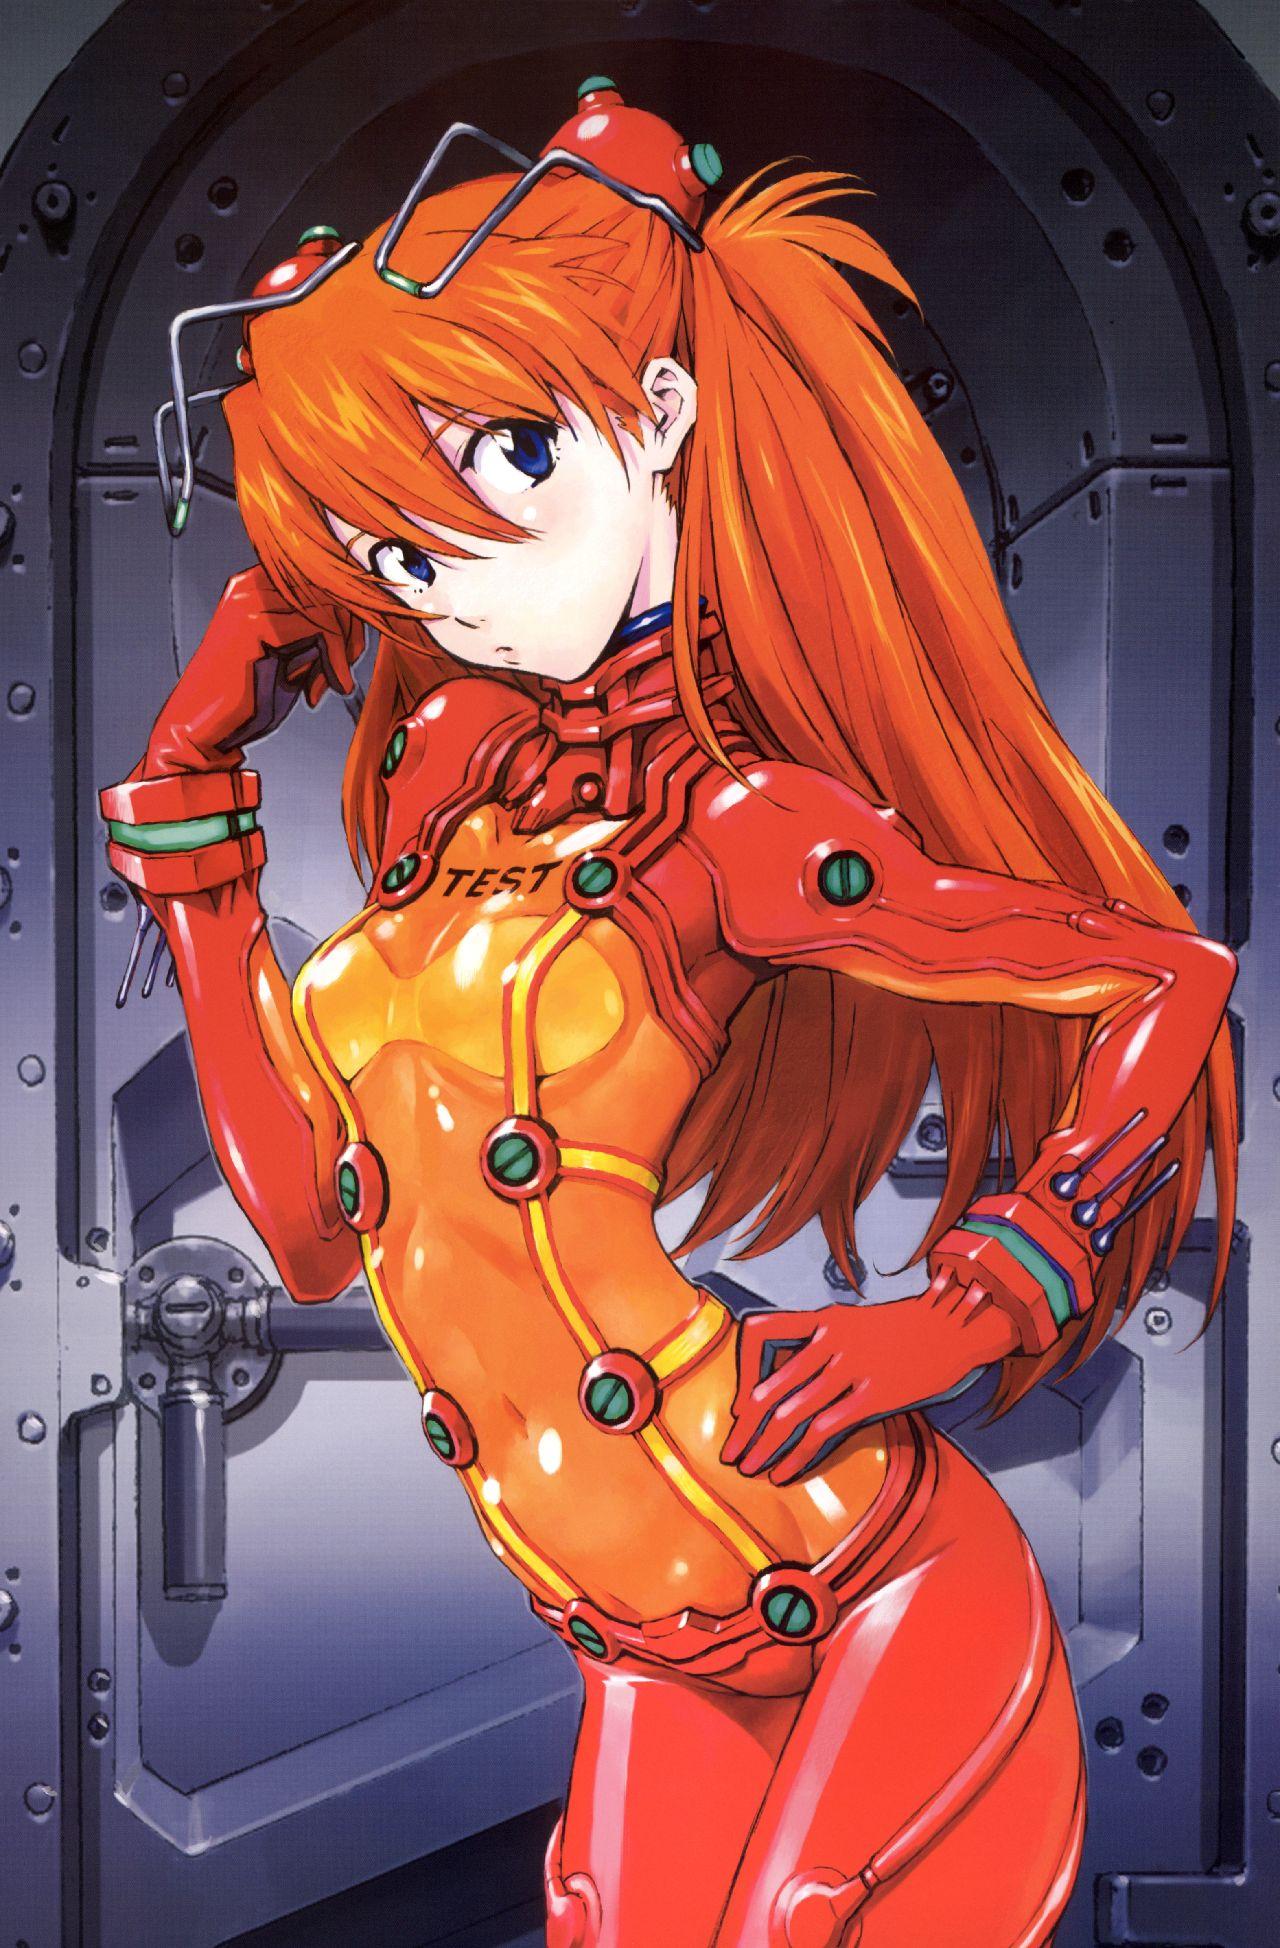 personajes de evangelion manga